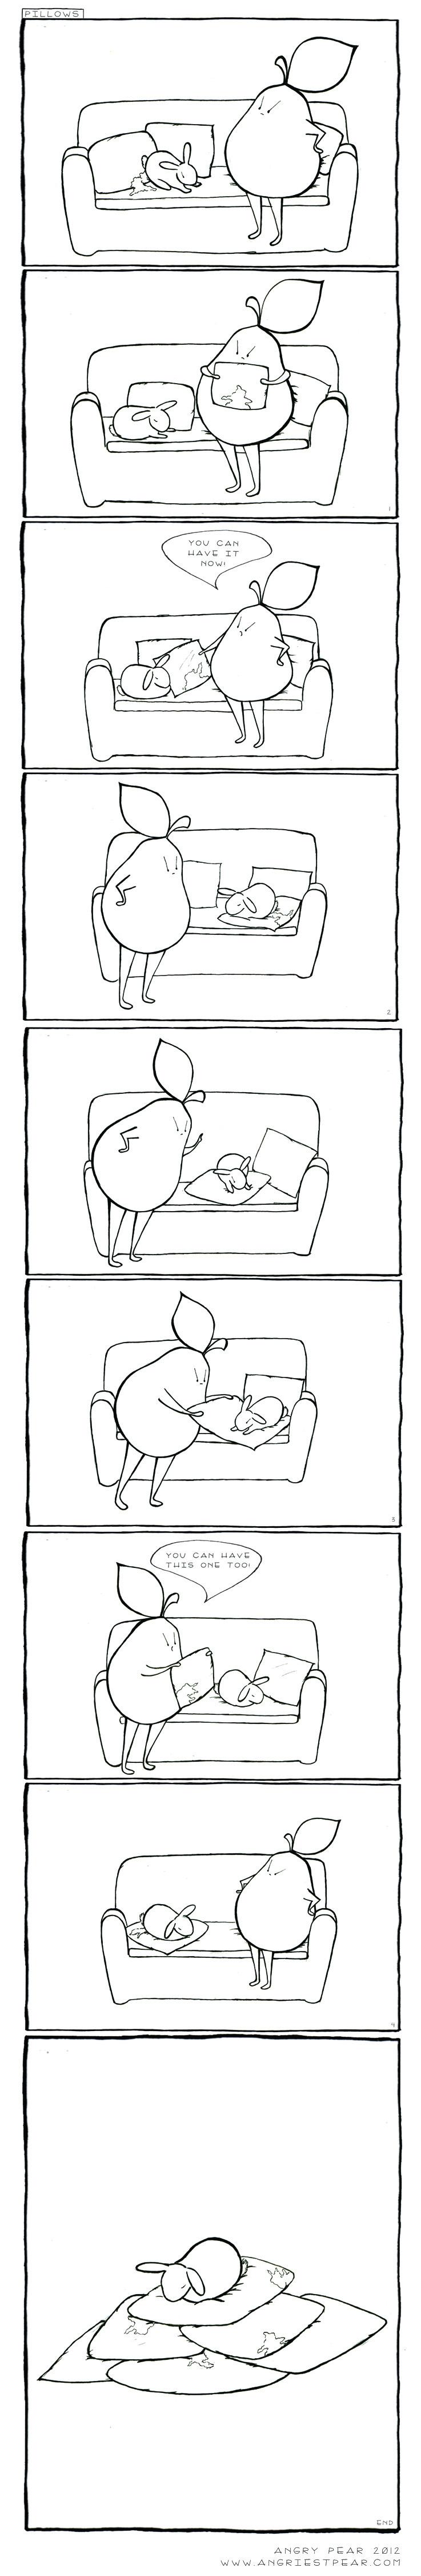 rabbit pillows full